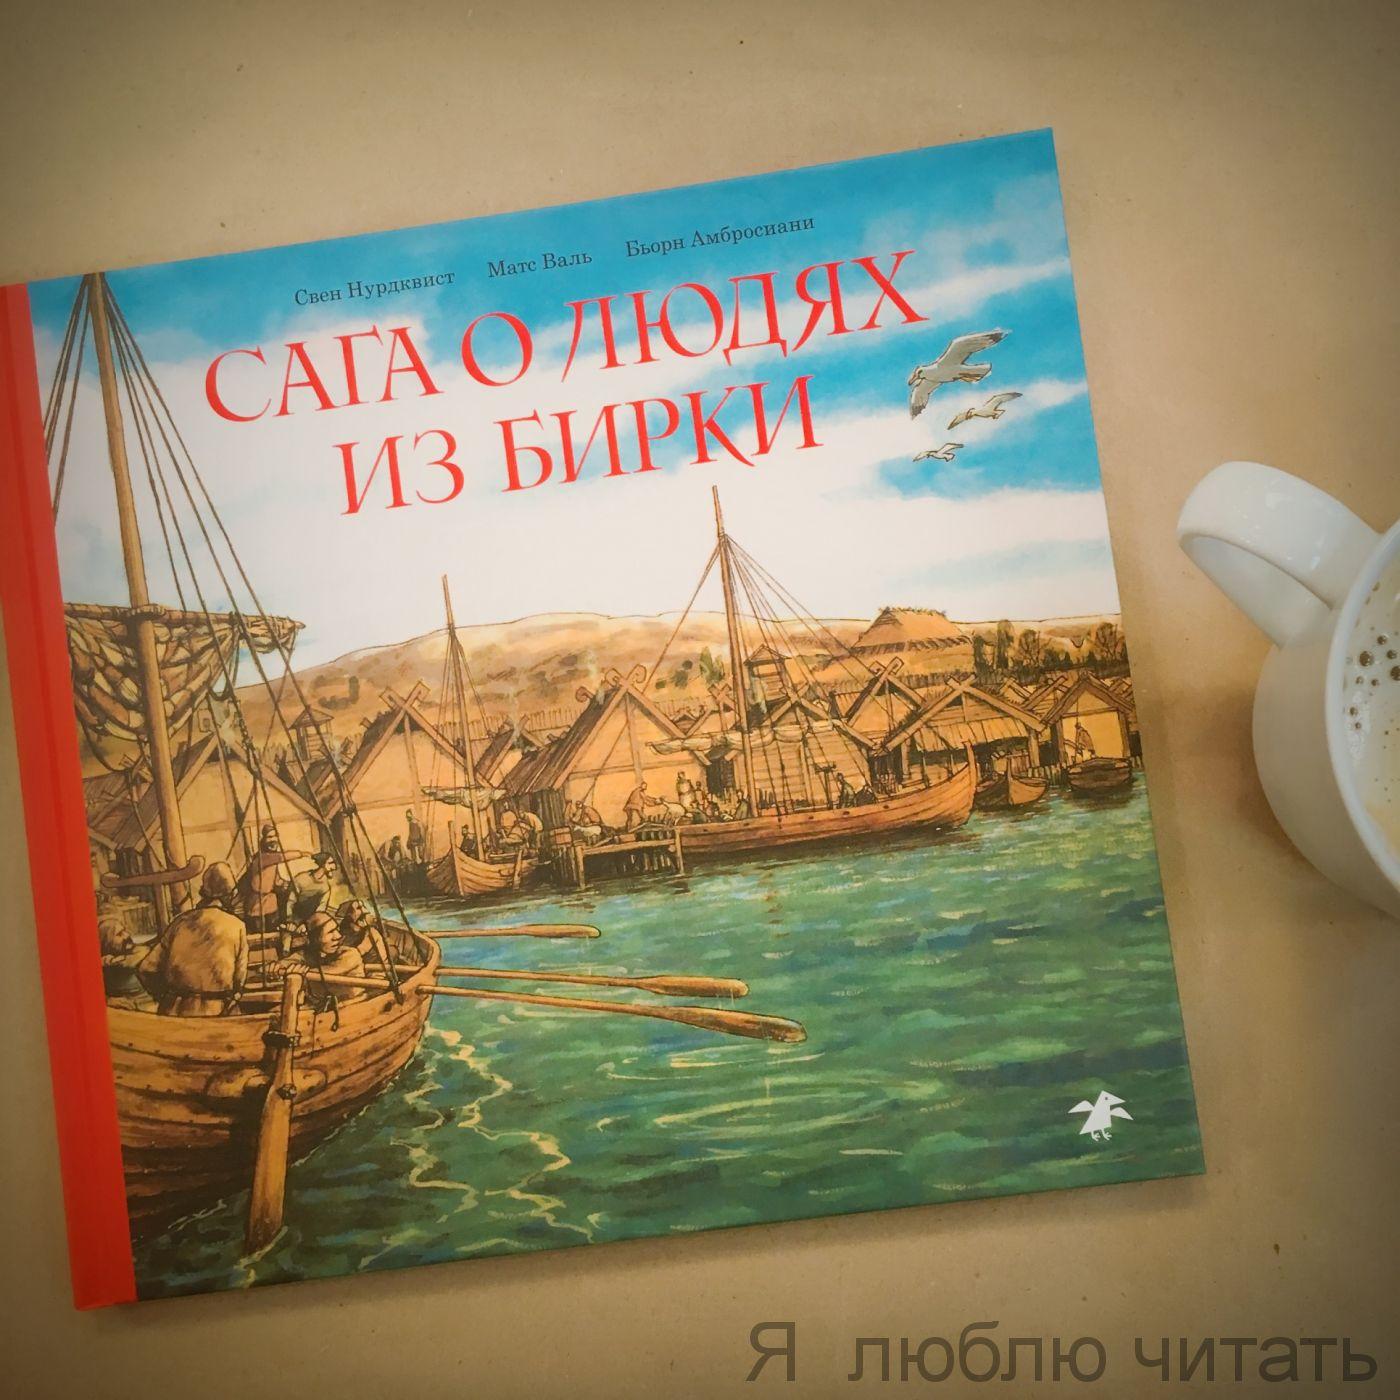 Сага о людях из Бирки, шведского города эпохи викингов